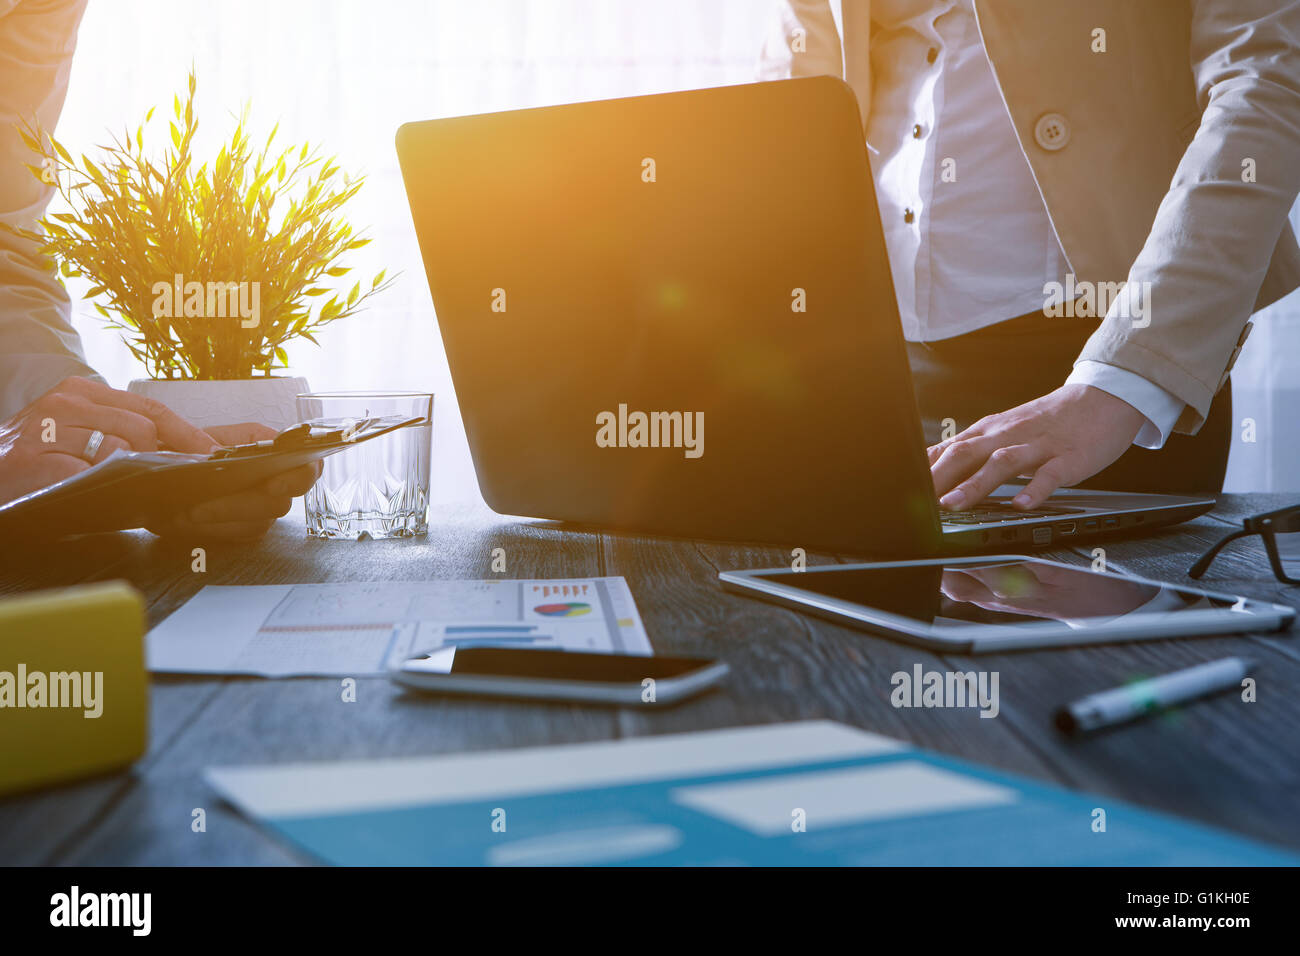 Planung Business Karriere arbeitsreichen Laptop Arbeitsplatz - stock Bild Stockbild